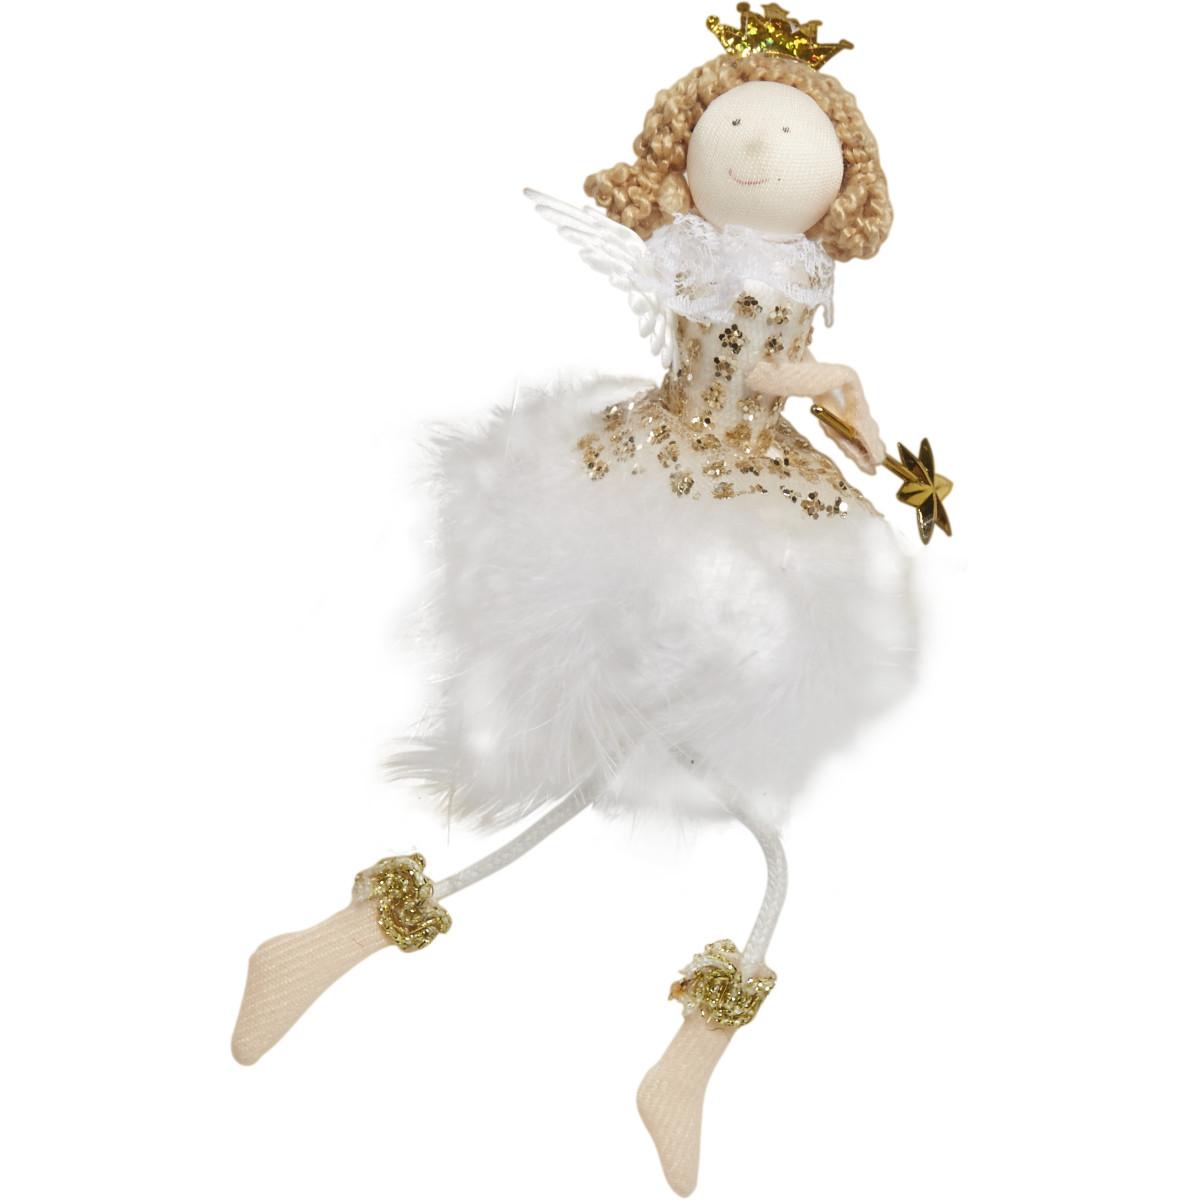 Мягкая Игрушка Ангелочек 18 Цвет Белый/Желтый